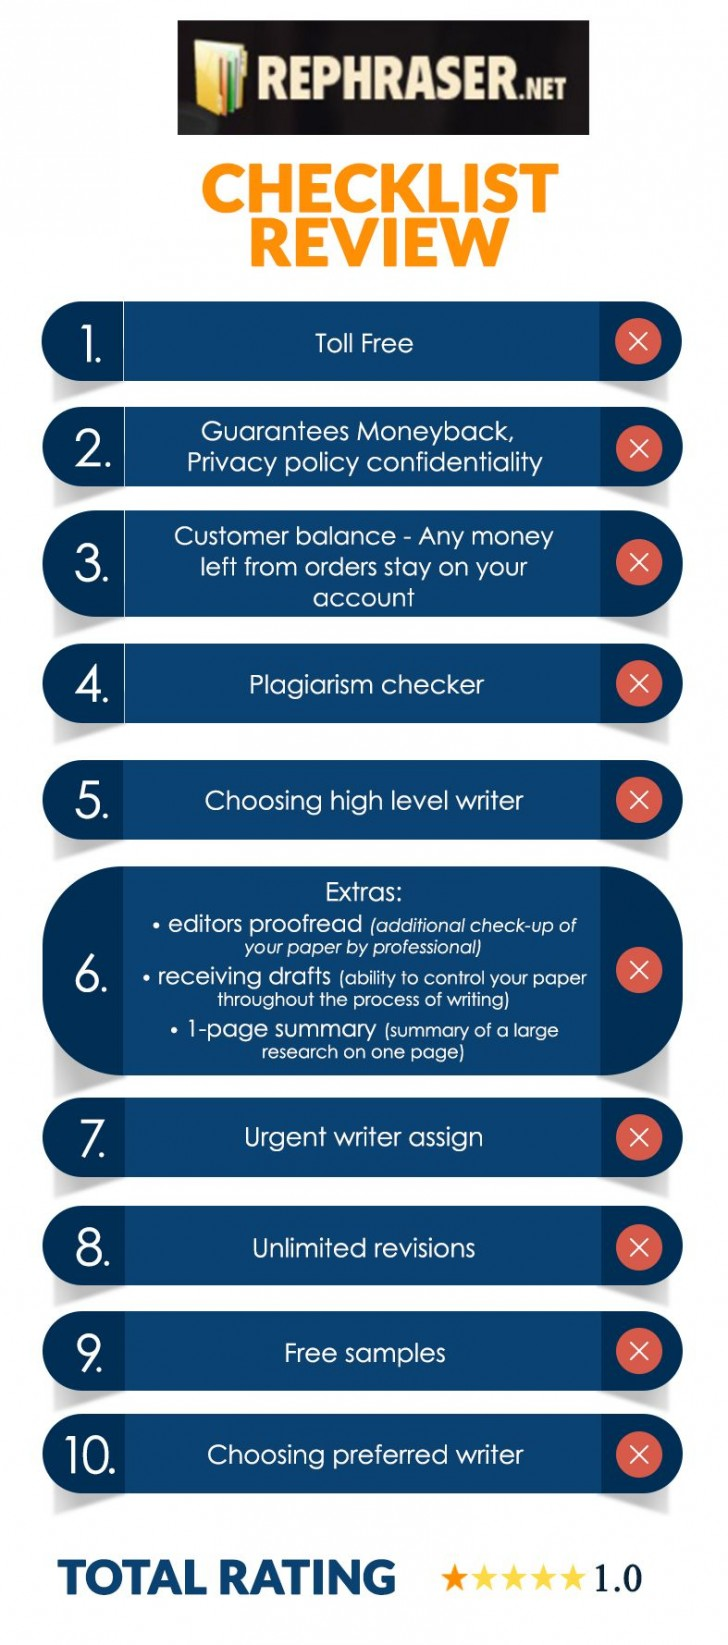 009 Essay Checker Free Online Amazing Sentence Grammar Plagiarism Document 728